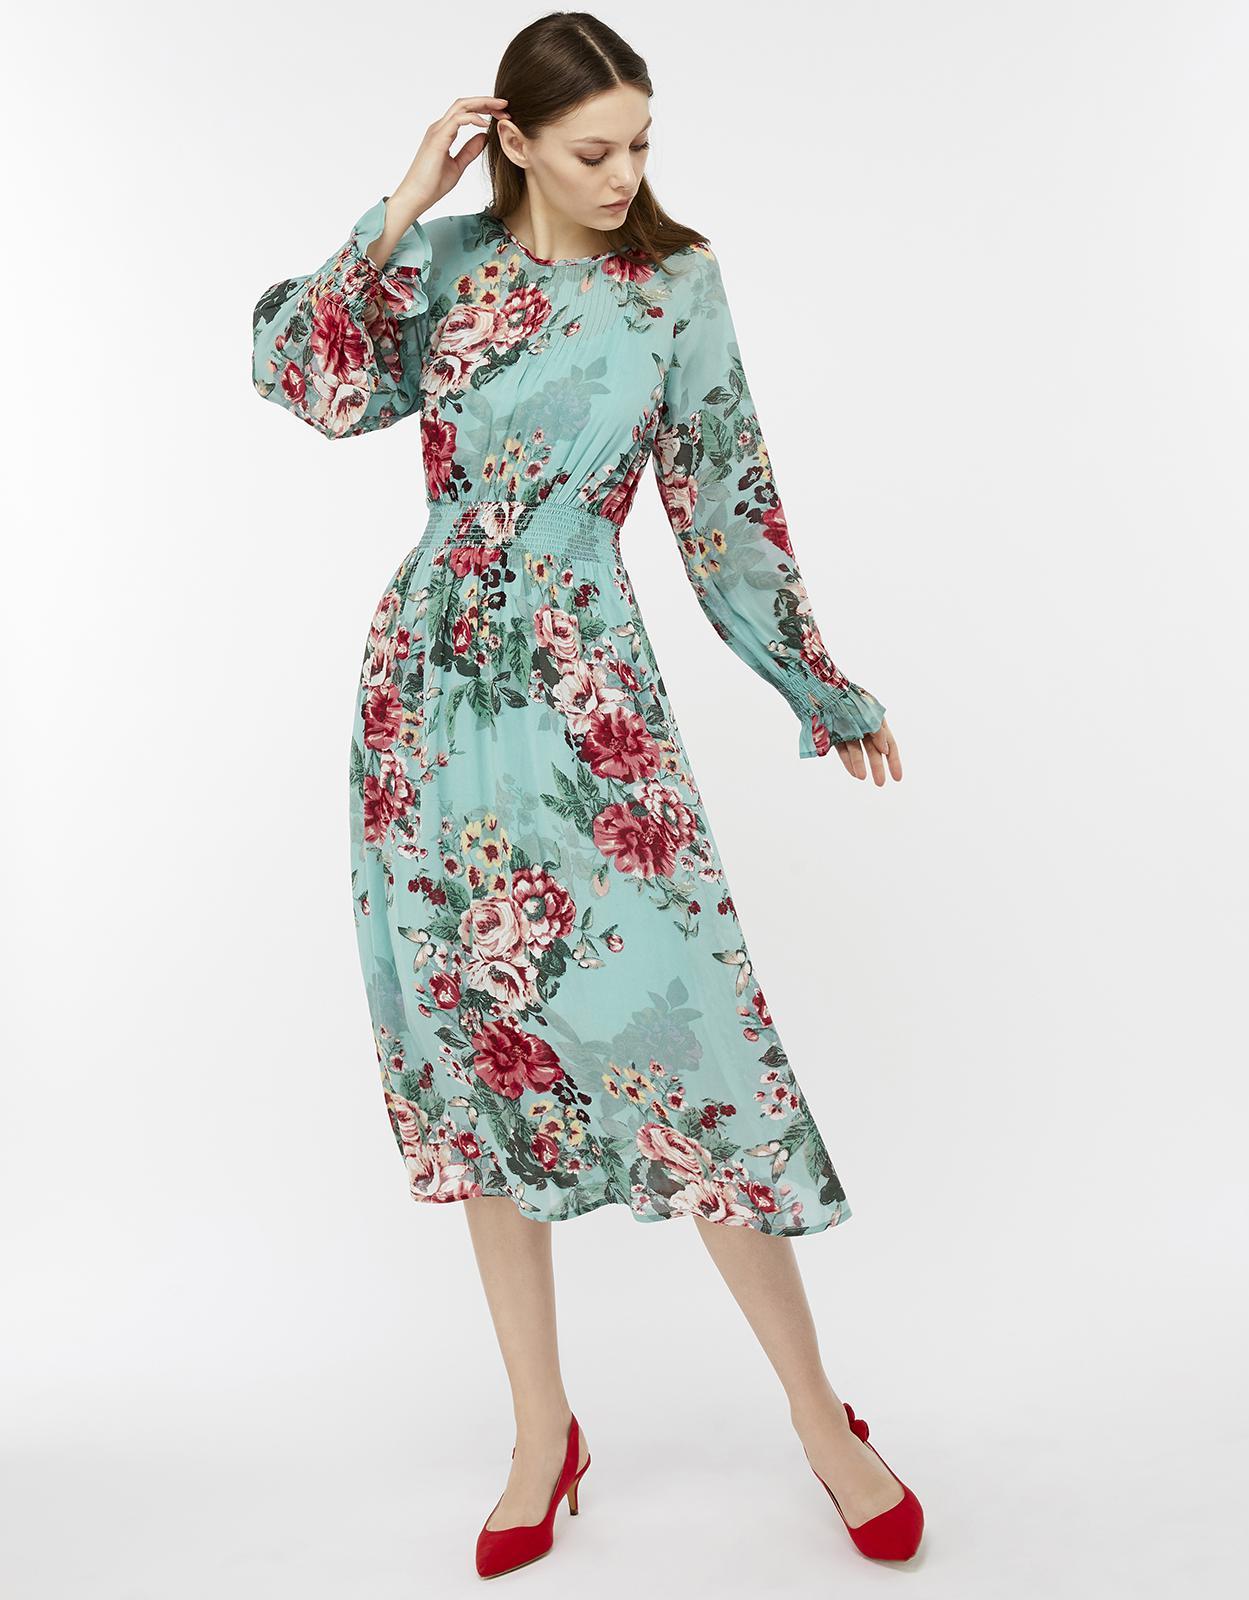 Monsoon Hollie Statement Print Dress - Lyst